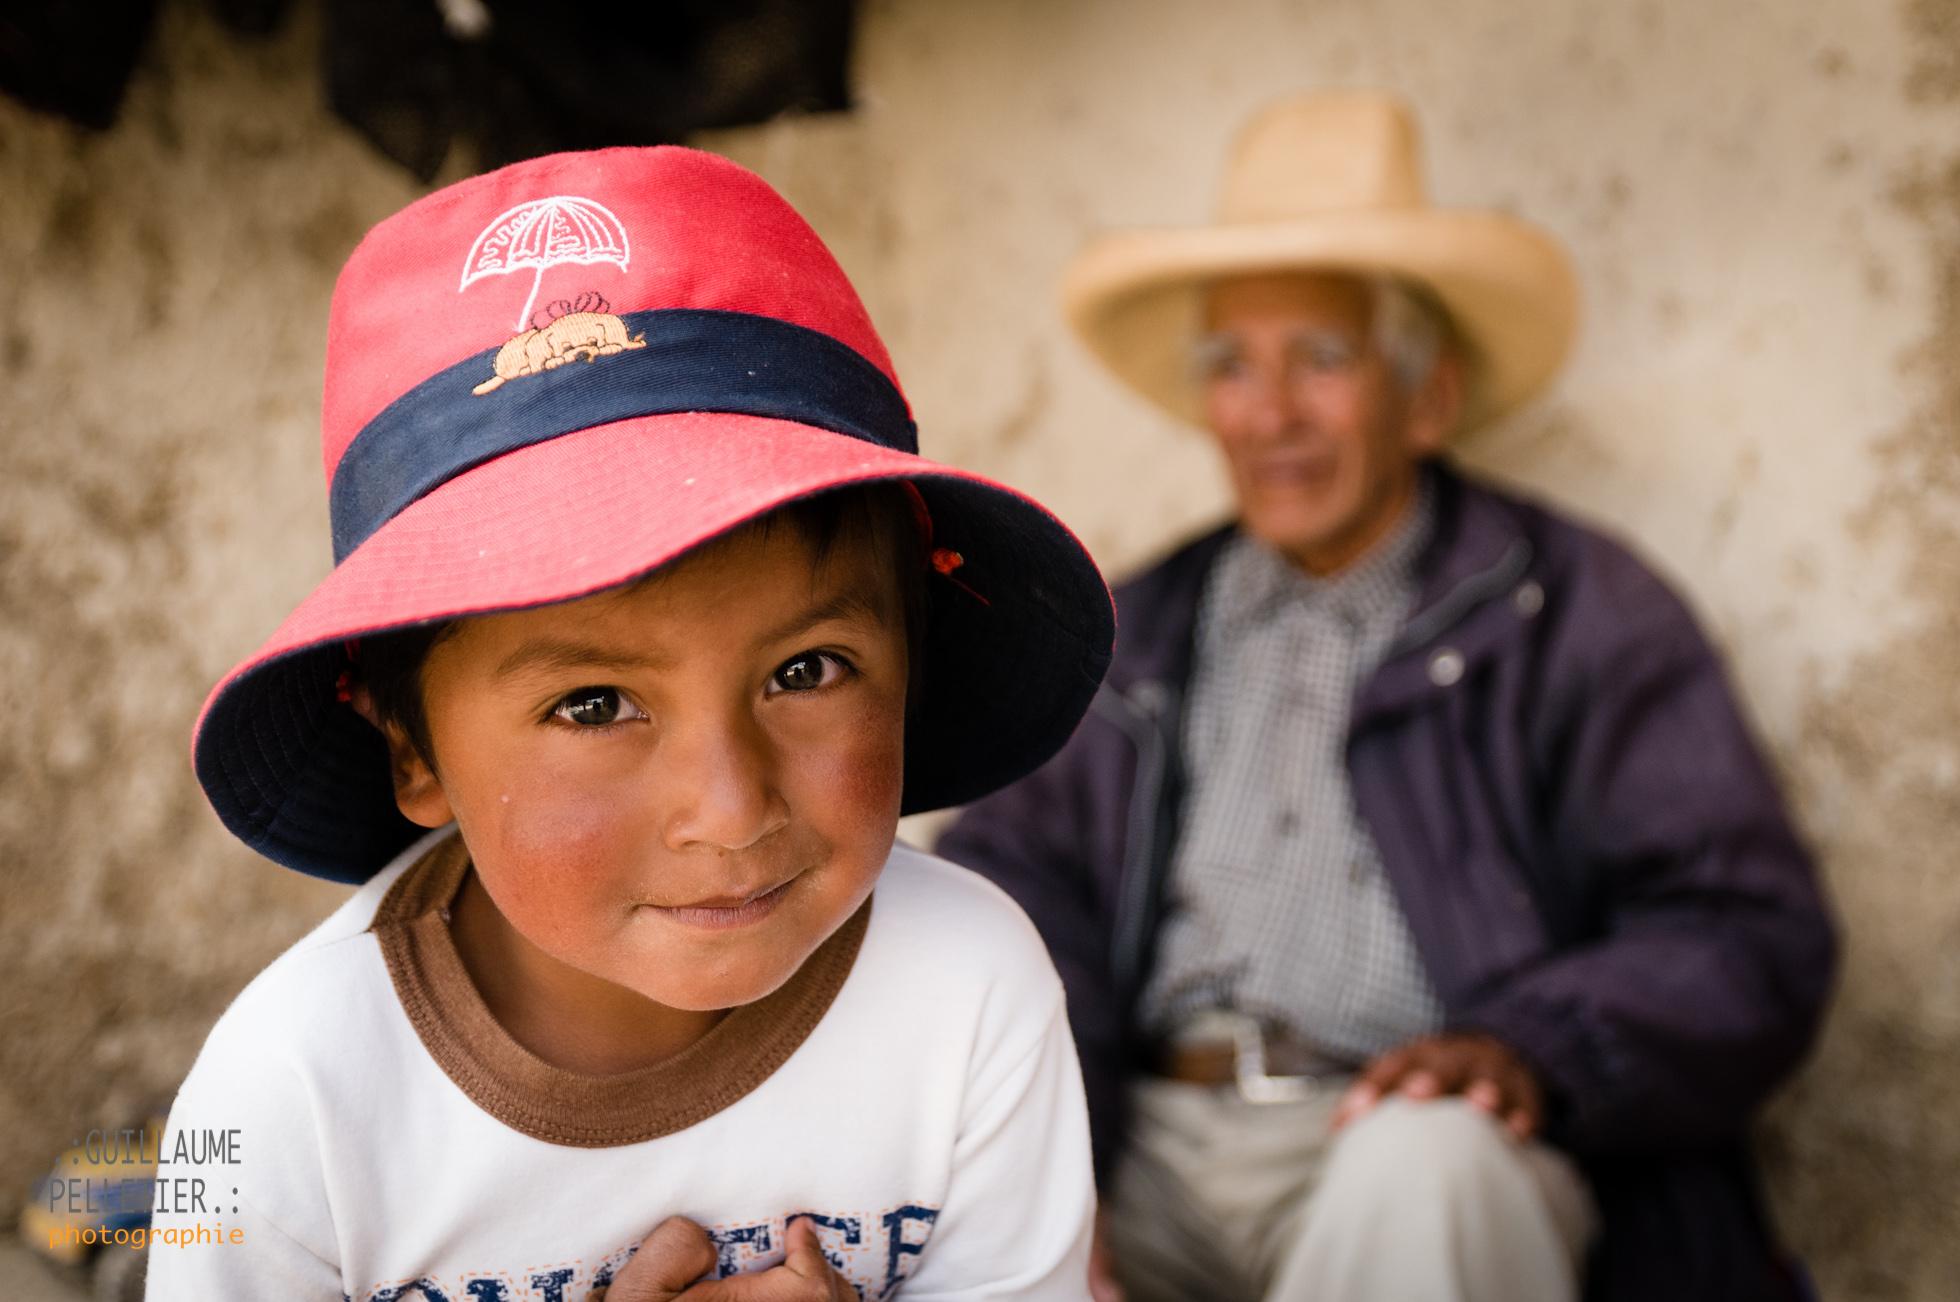 Cajabamba. The best hospitality! Photo Guillaume Pelletier